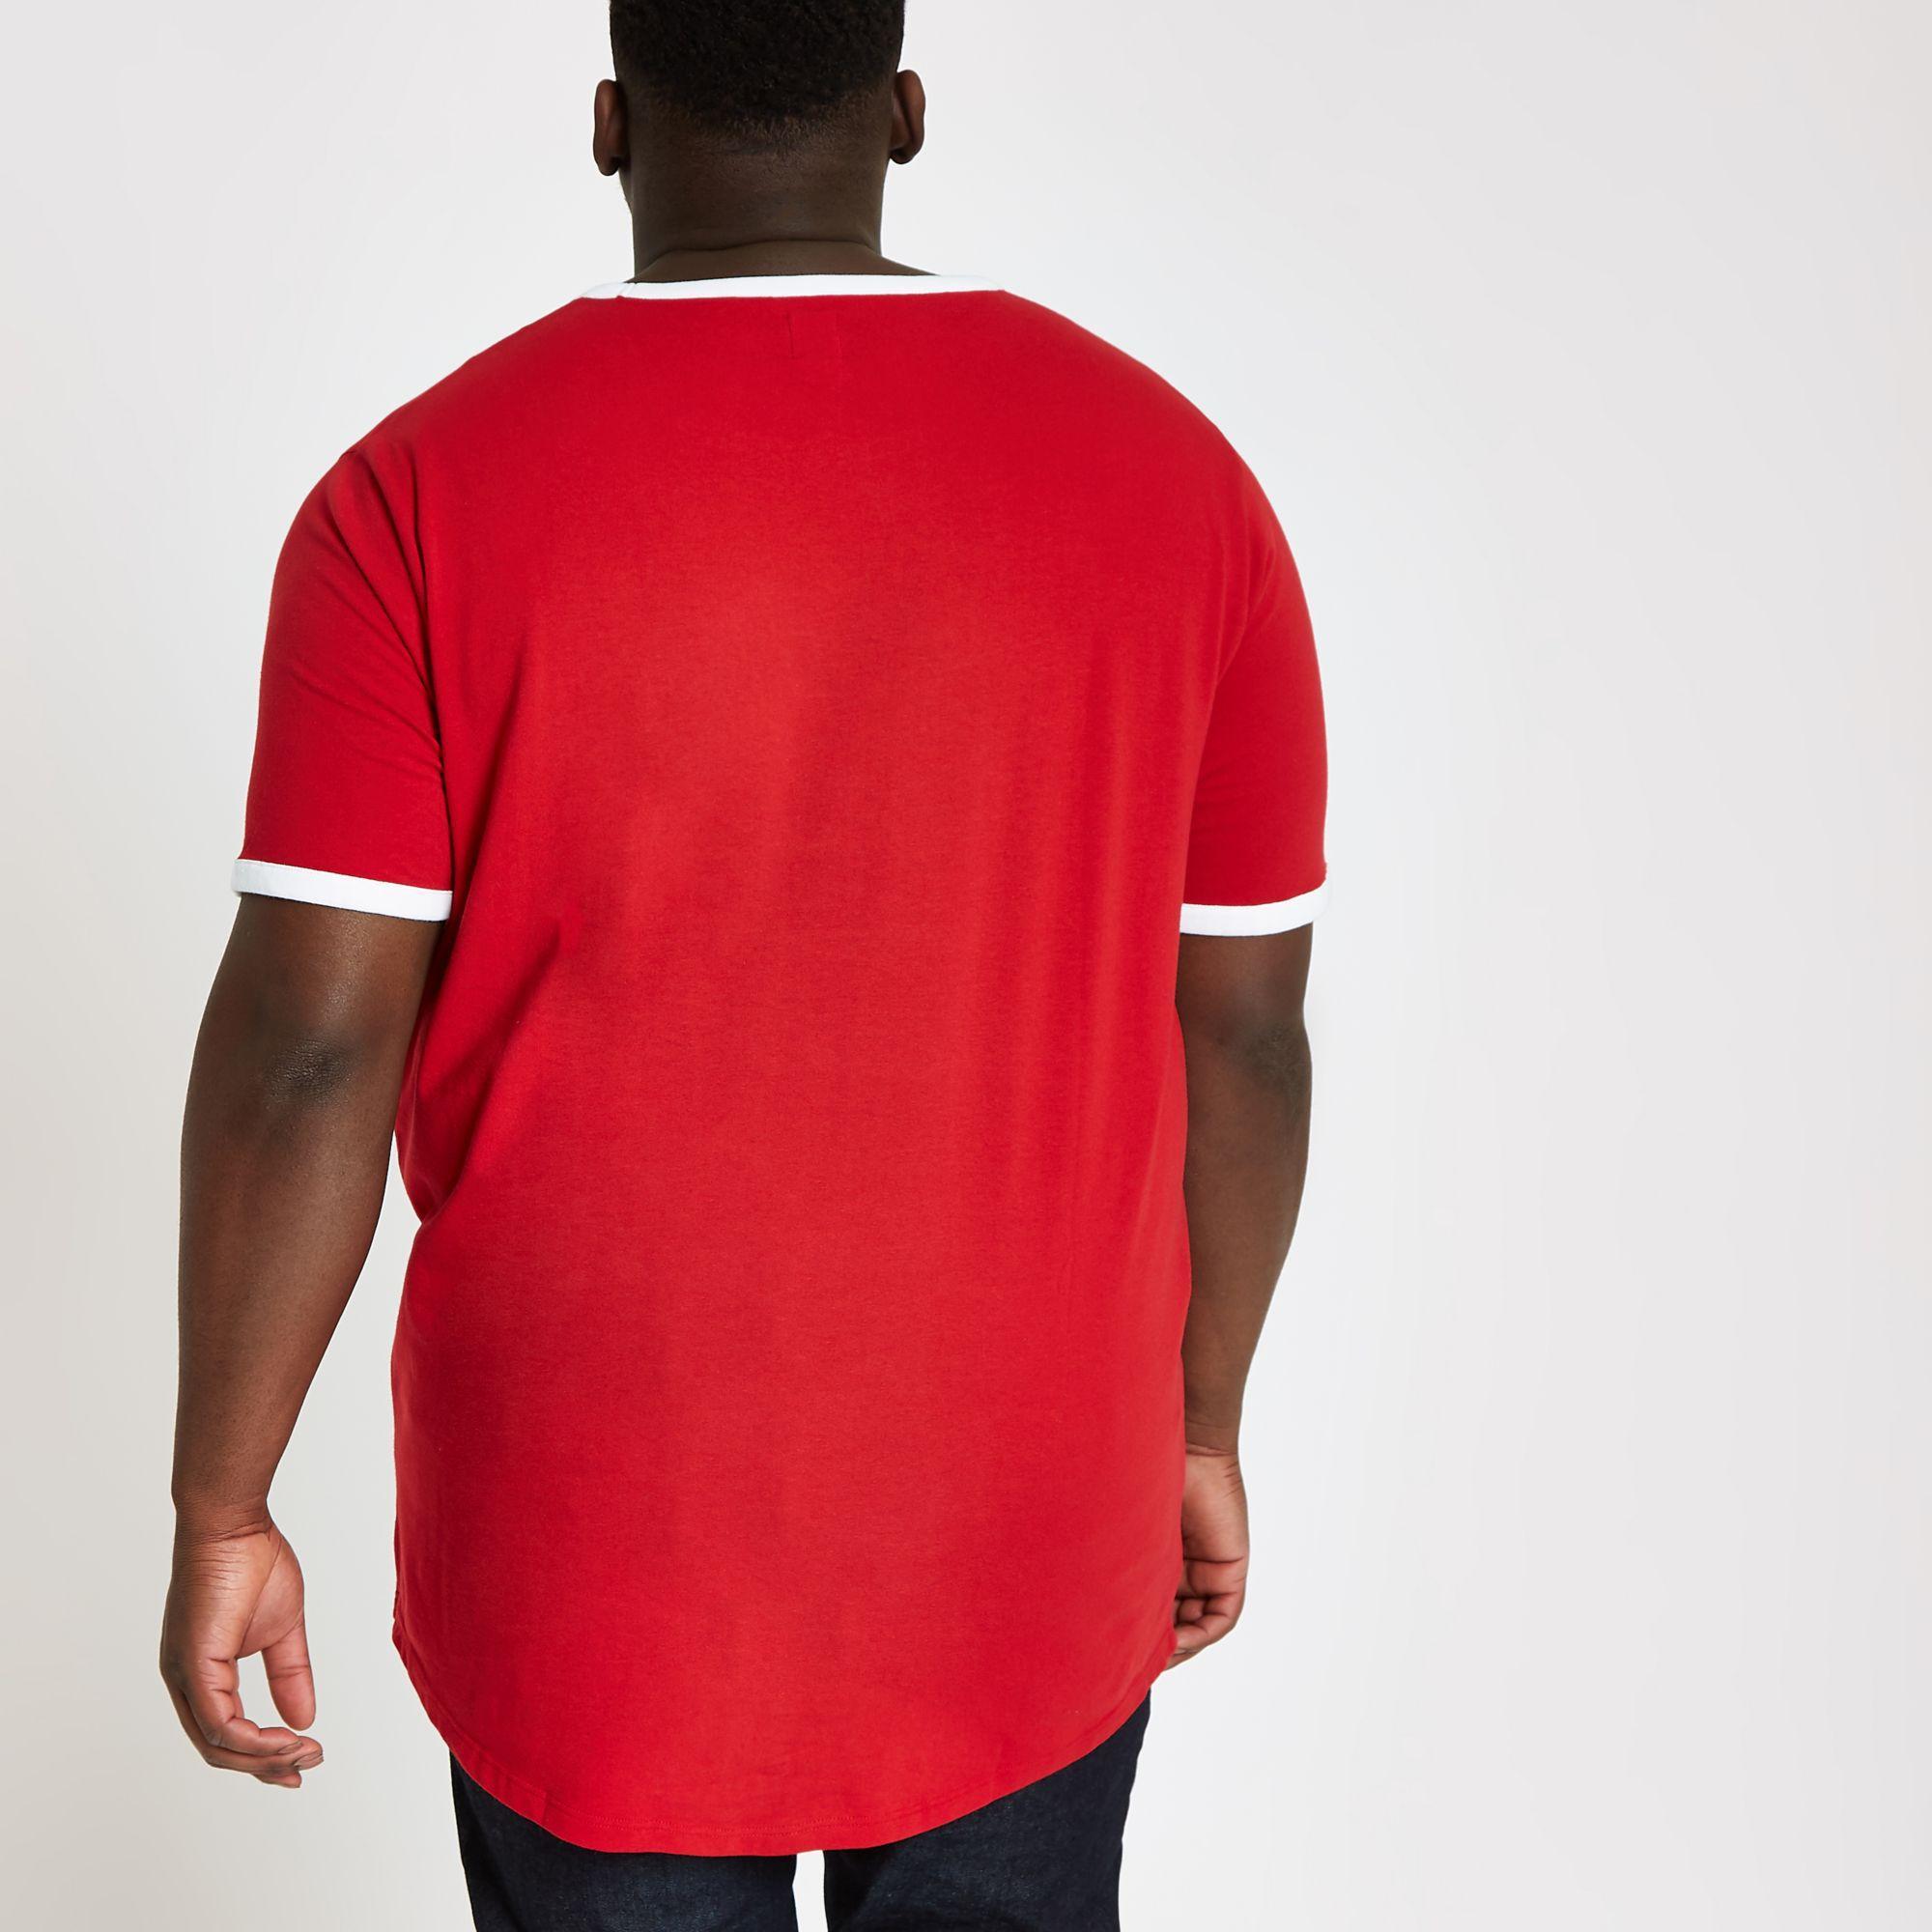 a4c53d5c772e ... Big And Tall Red 'prolific' Curve T-shirt for Men. View fullscreen